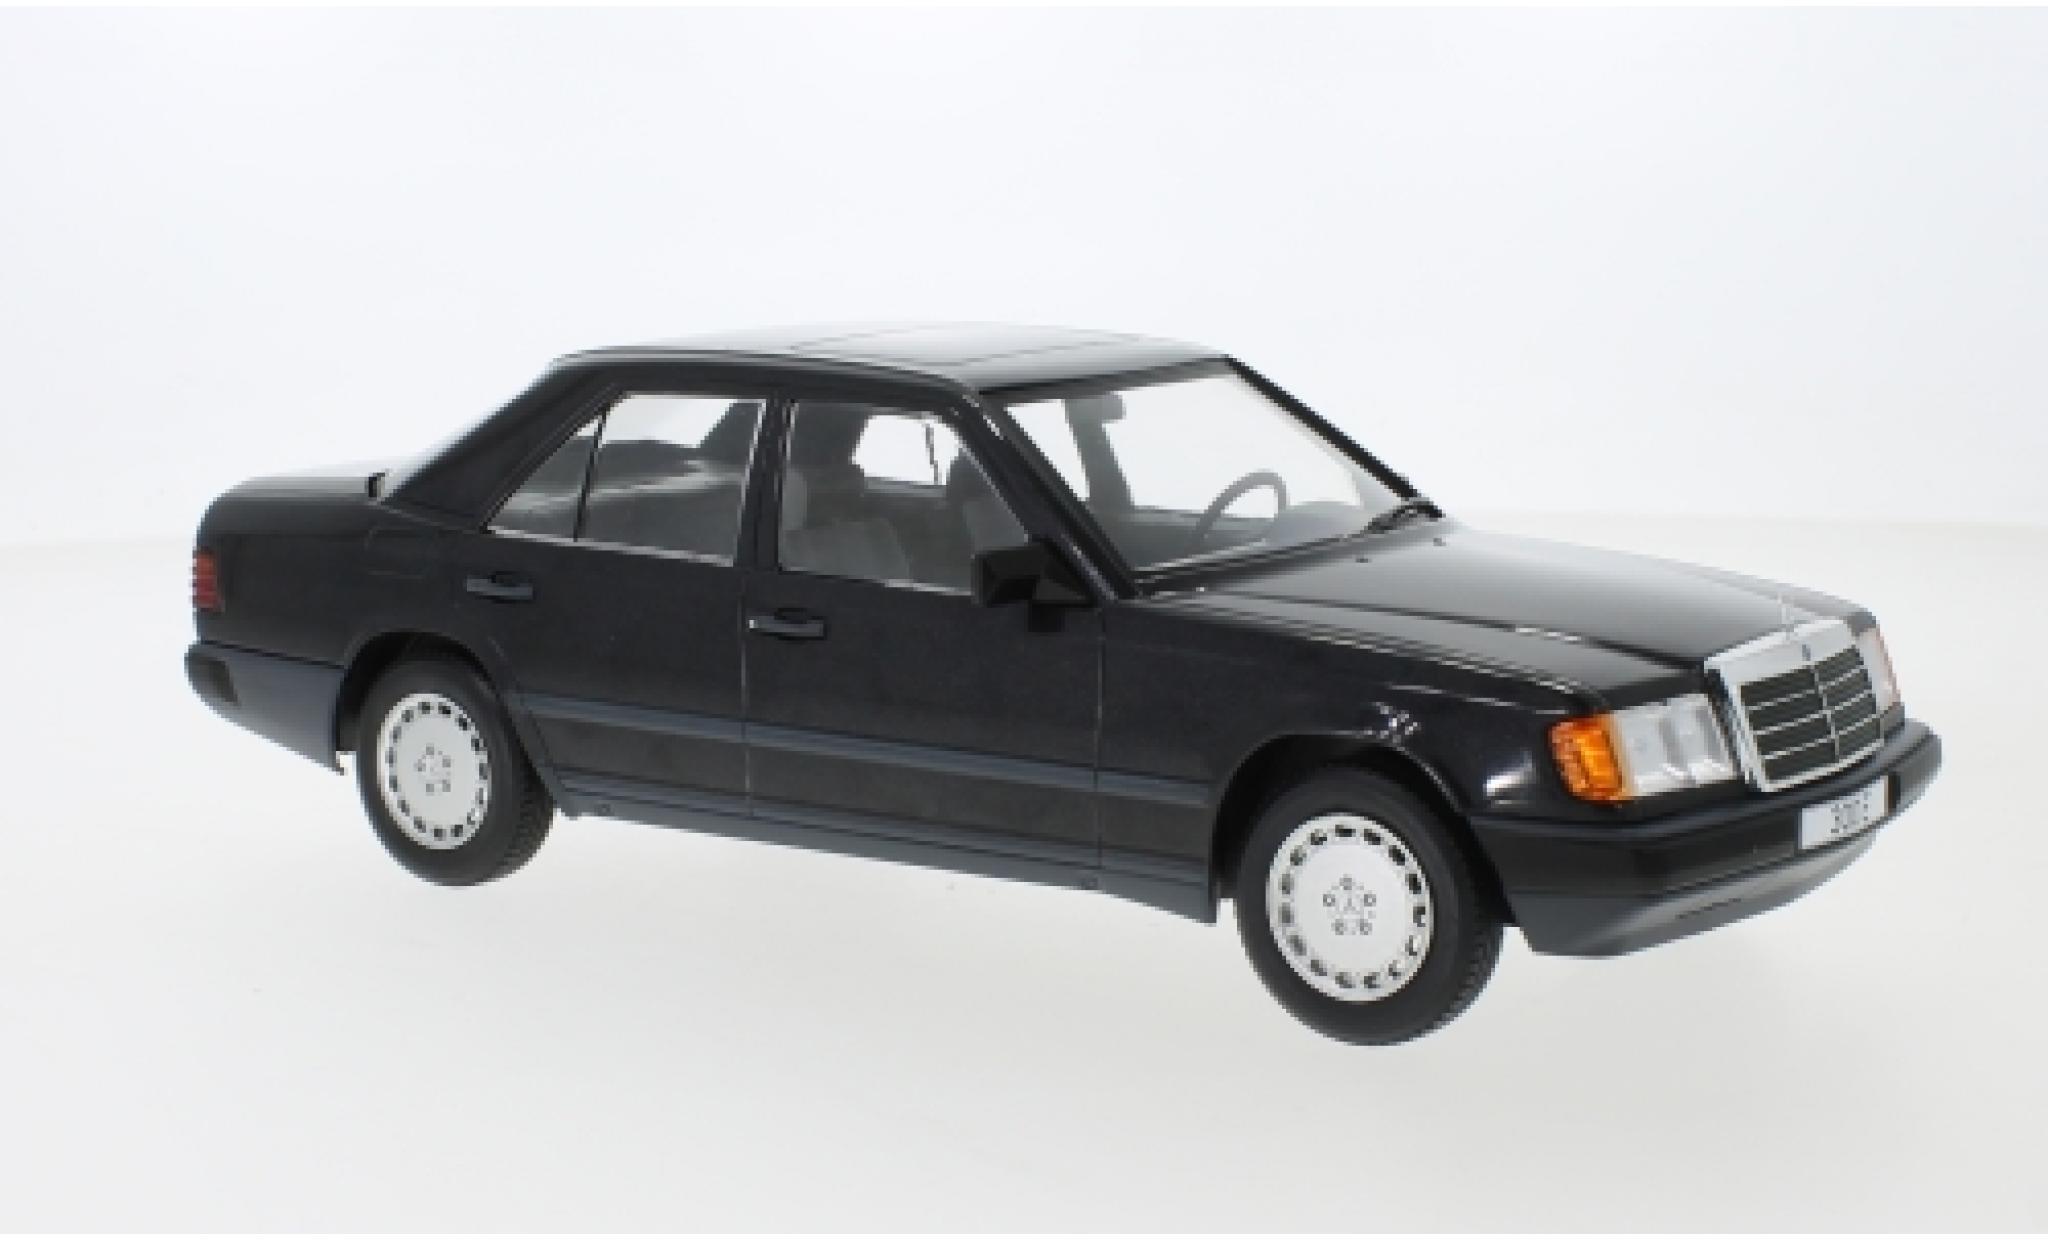 1984 Mercedes-Benz 300E Limousine W124 Antracita Gray 1:18 MC Group 18100